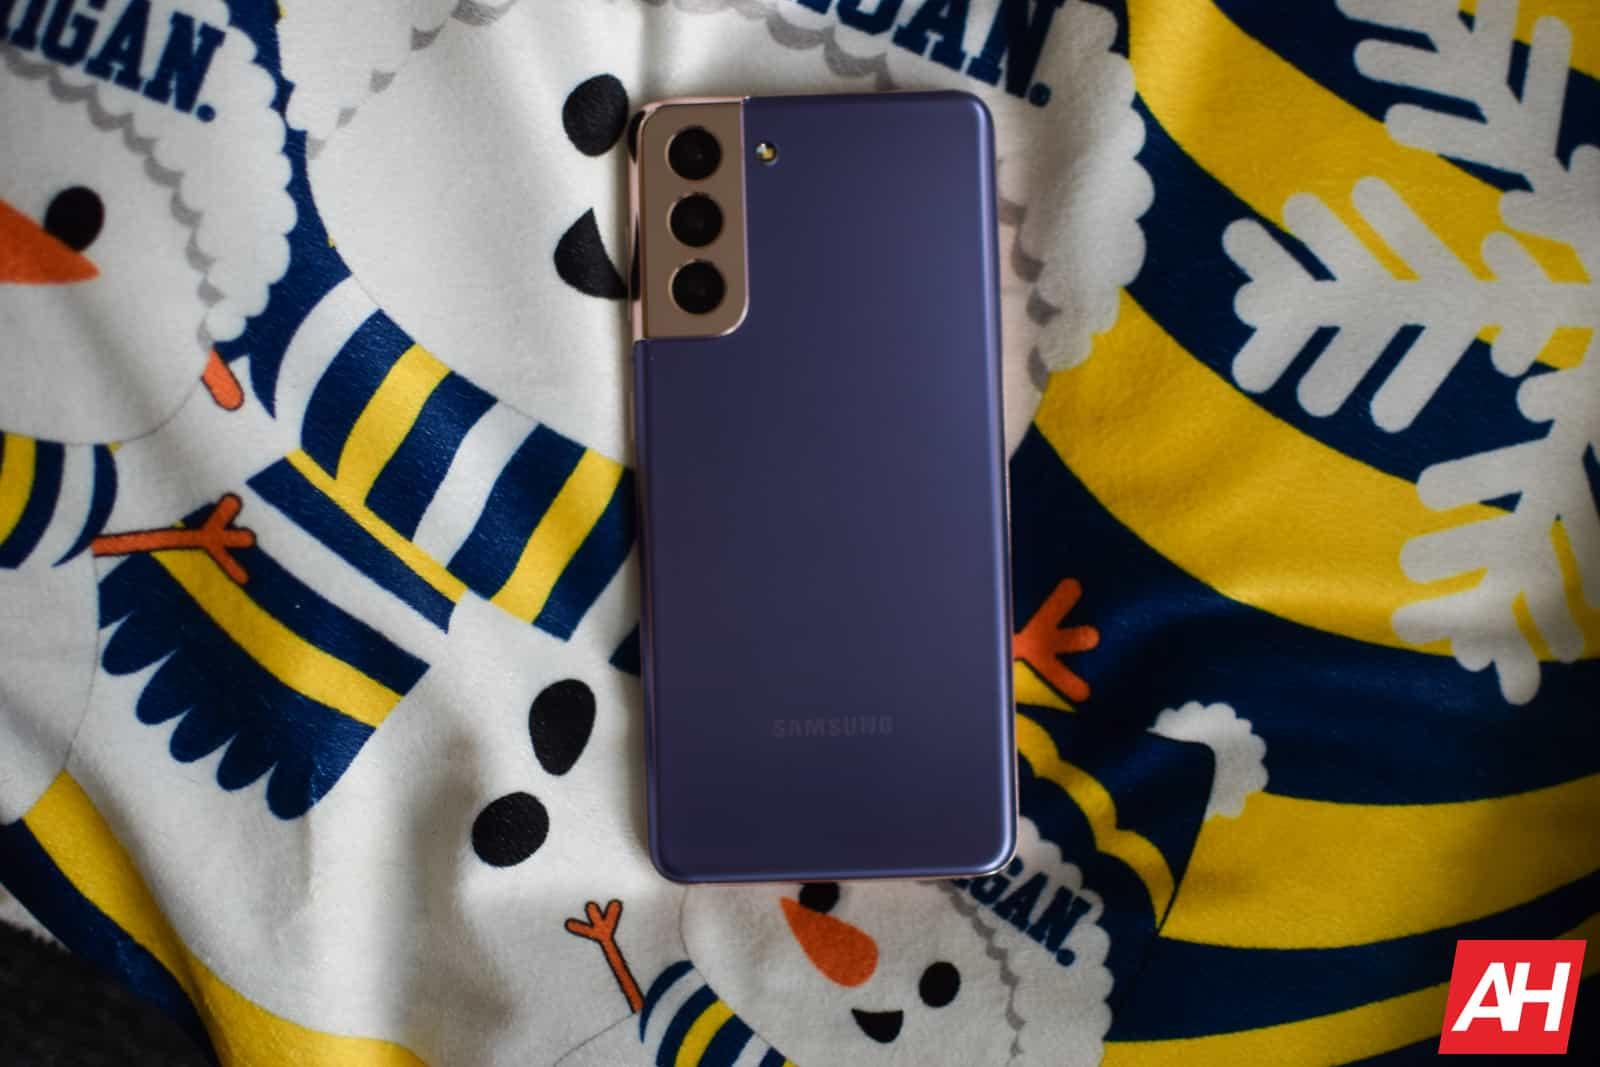 Samsung Galaxy S21 Review AM AH 05